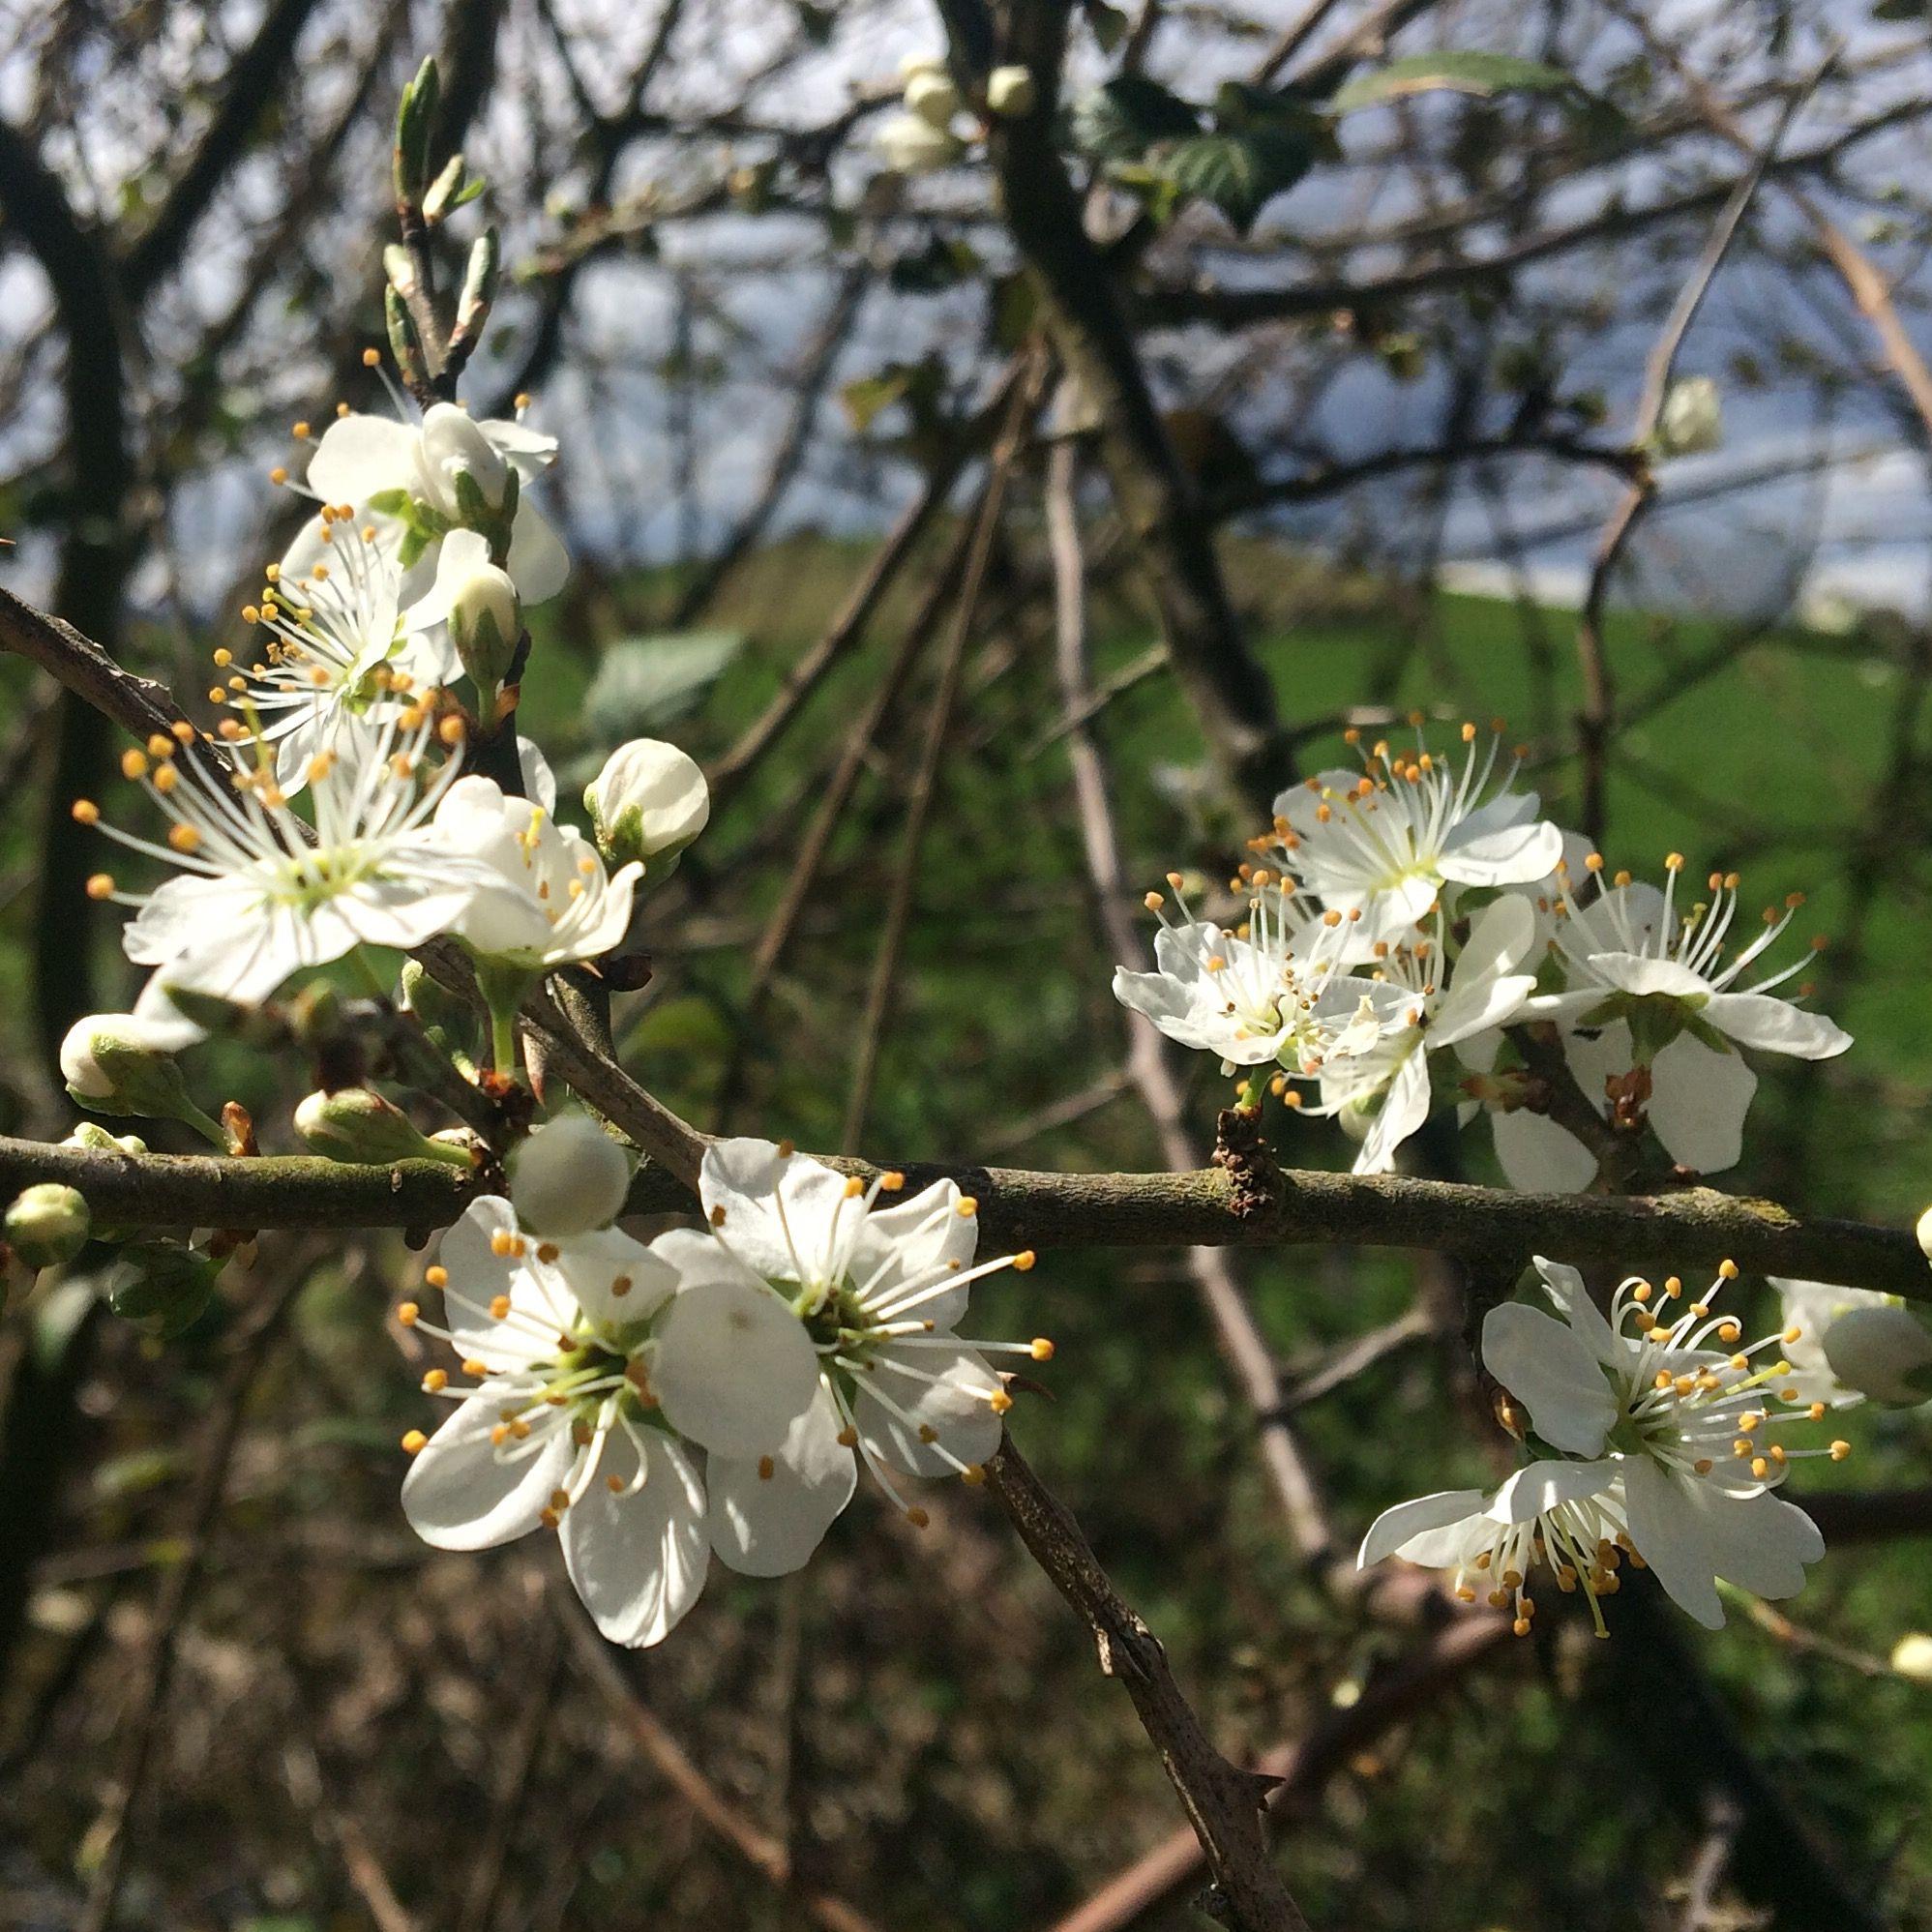 La primavera ya ha llegado a Agroturismo Arkaia #turismo #rural junto a #VitoriaGasteiz